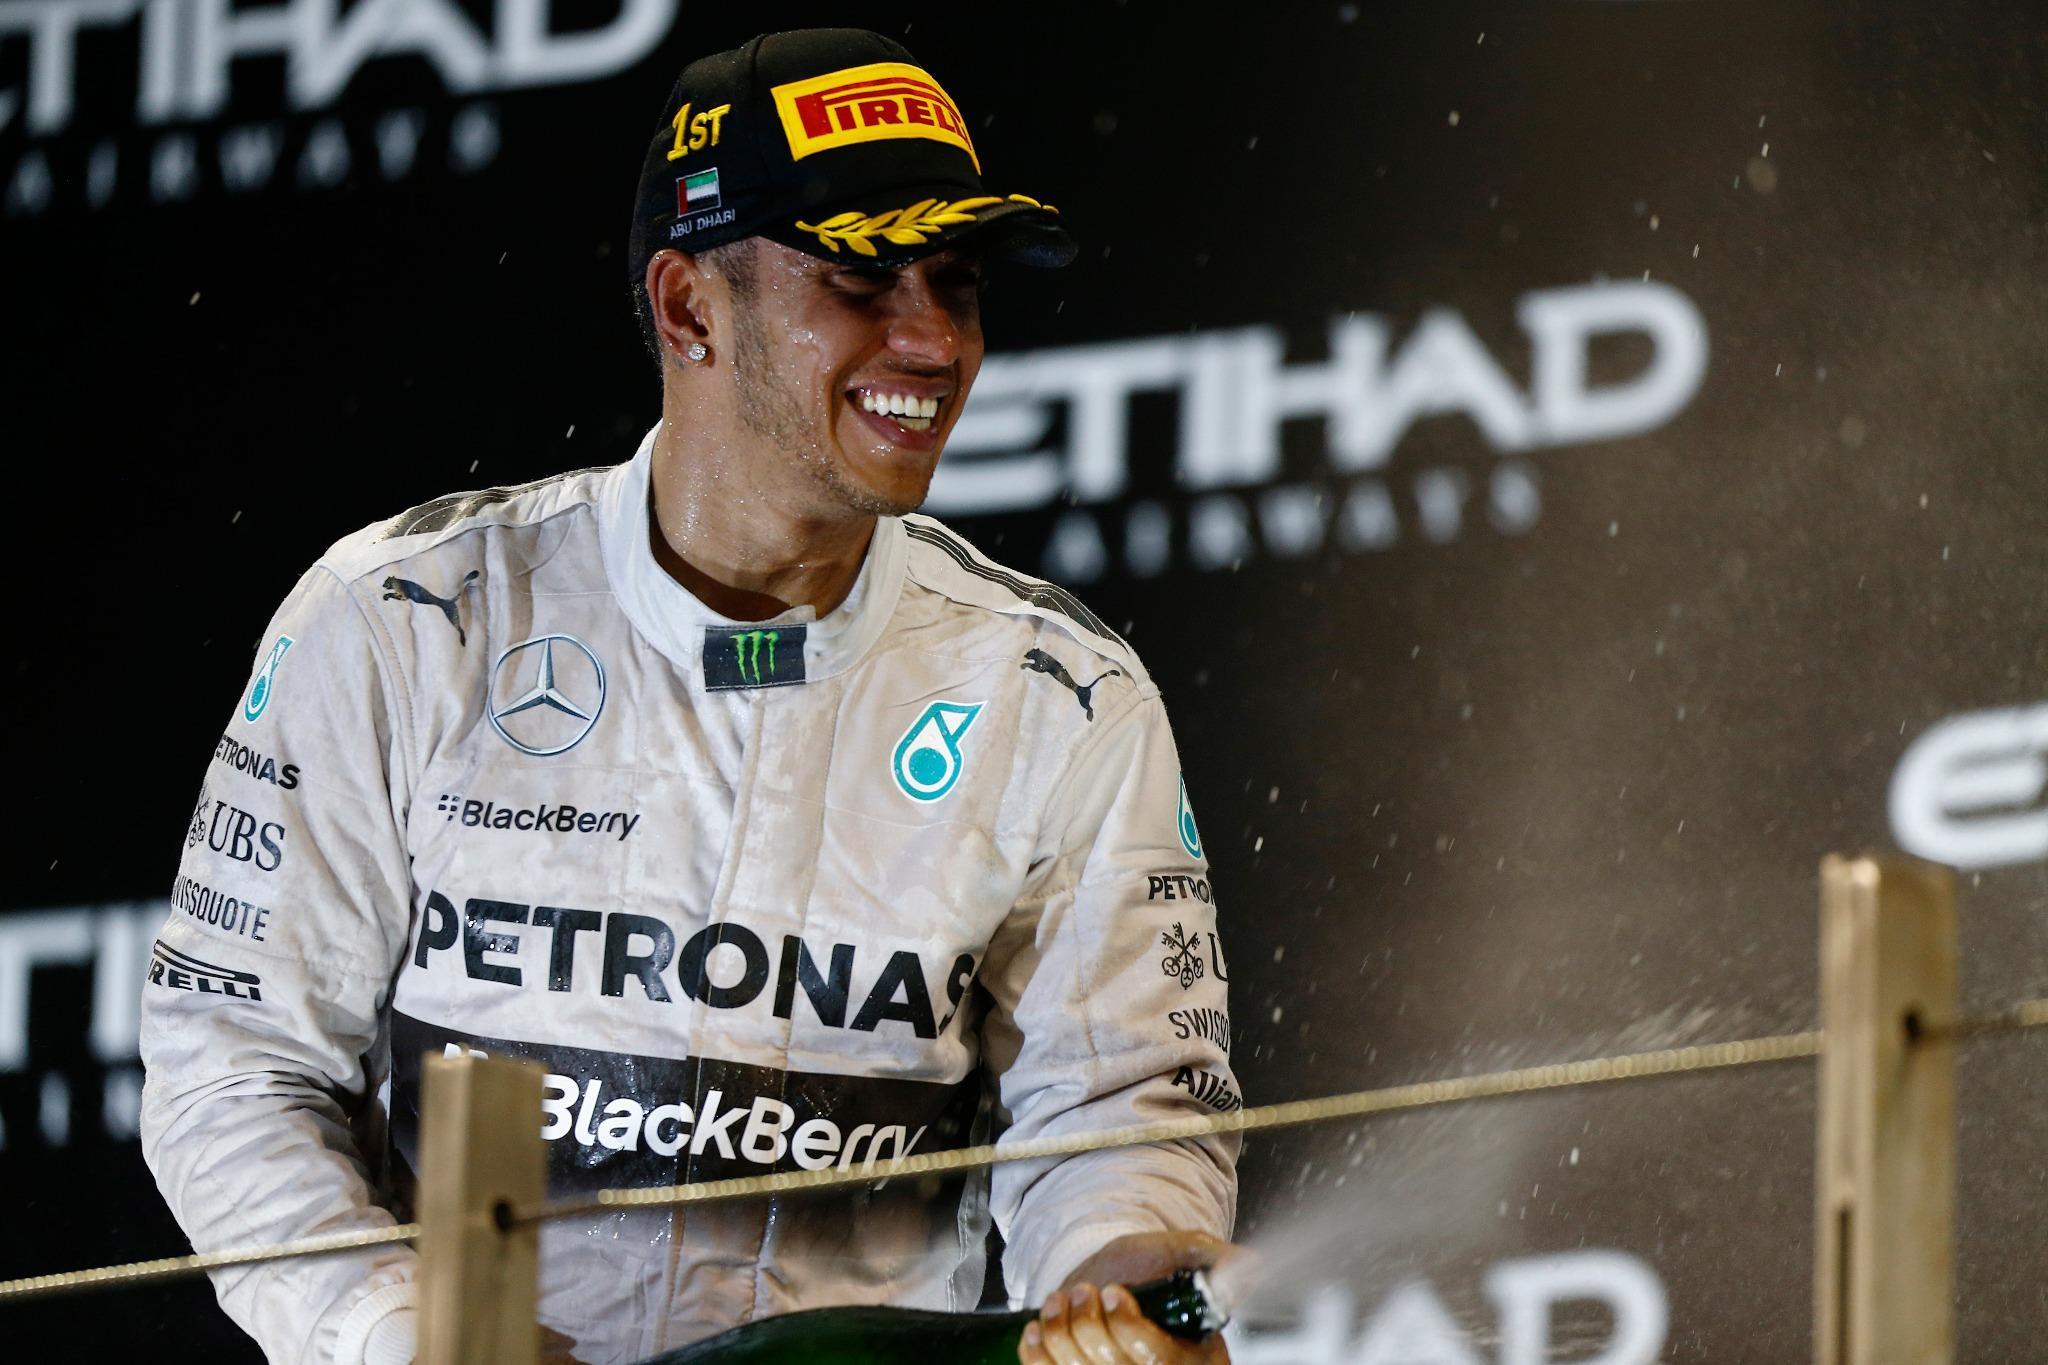 RT @MercedesAMGF1: How sweet does that taste for @LewisHamilton?! Spray away Lewis - you're a DOUBLE #F1 #W05LDCHAMPION!!! #AbuDhabiGP http…